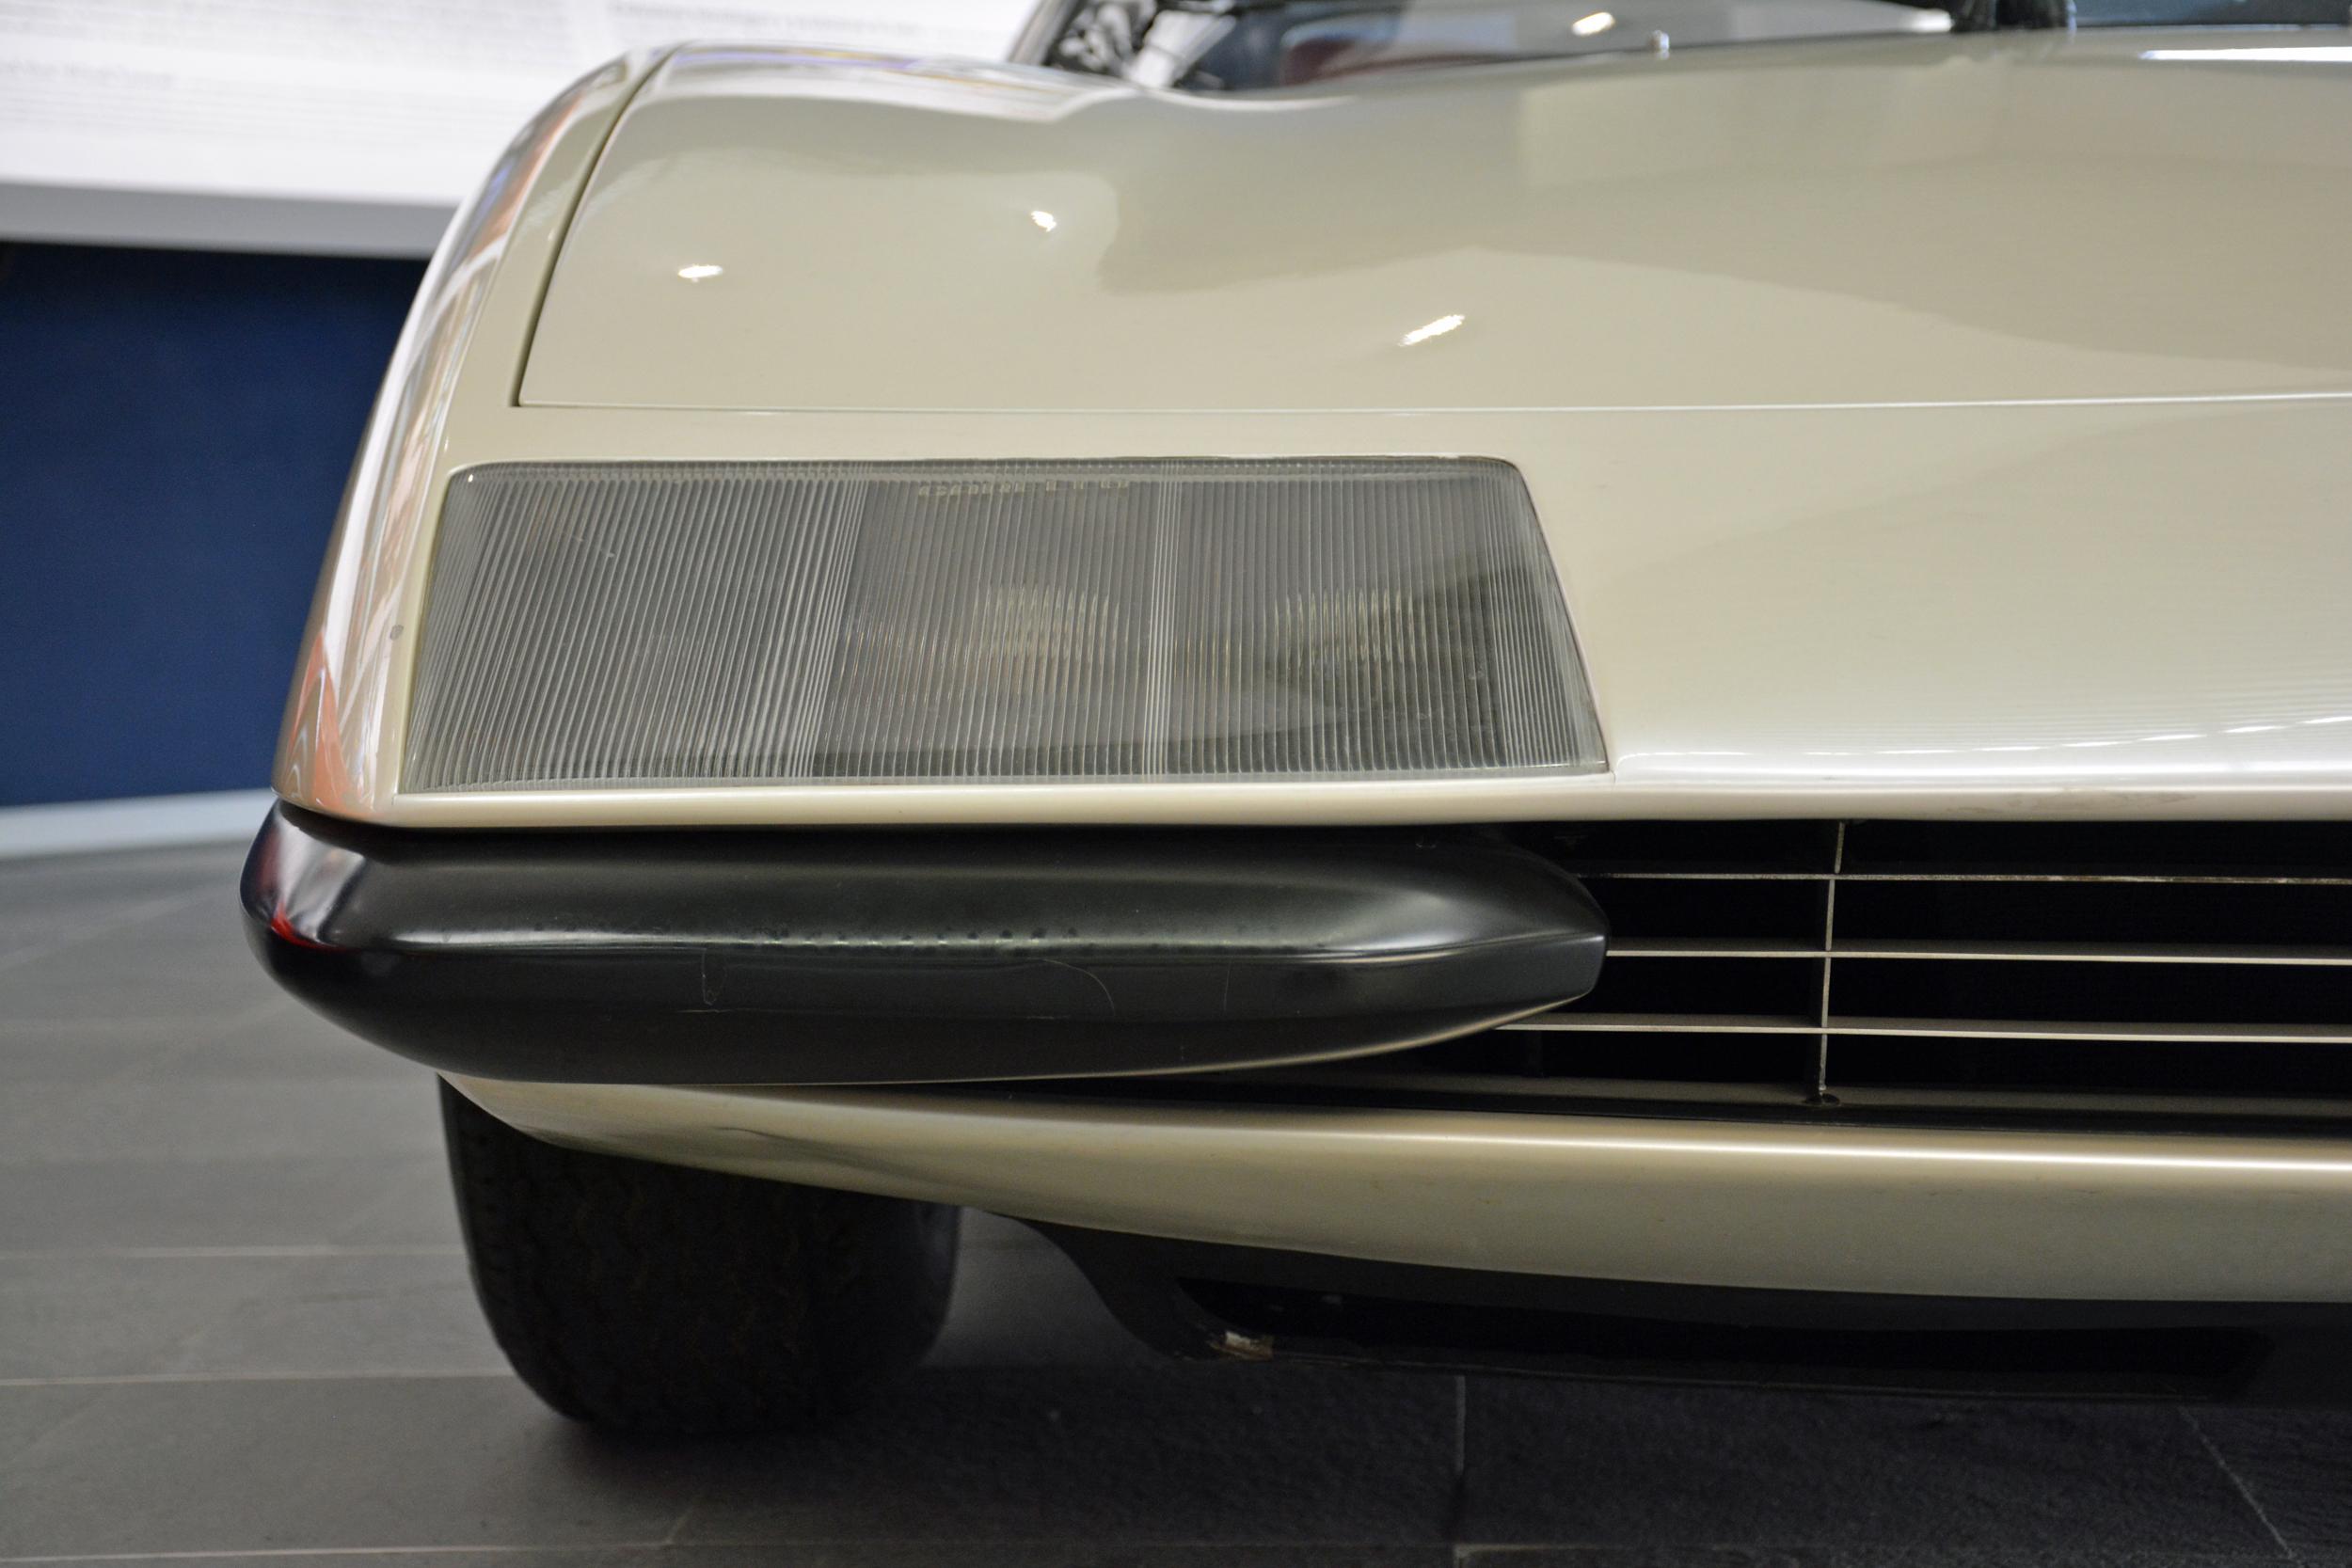 1968 ferrari p6 prototype left headlight